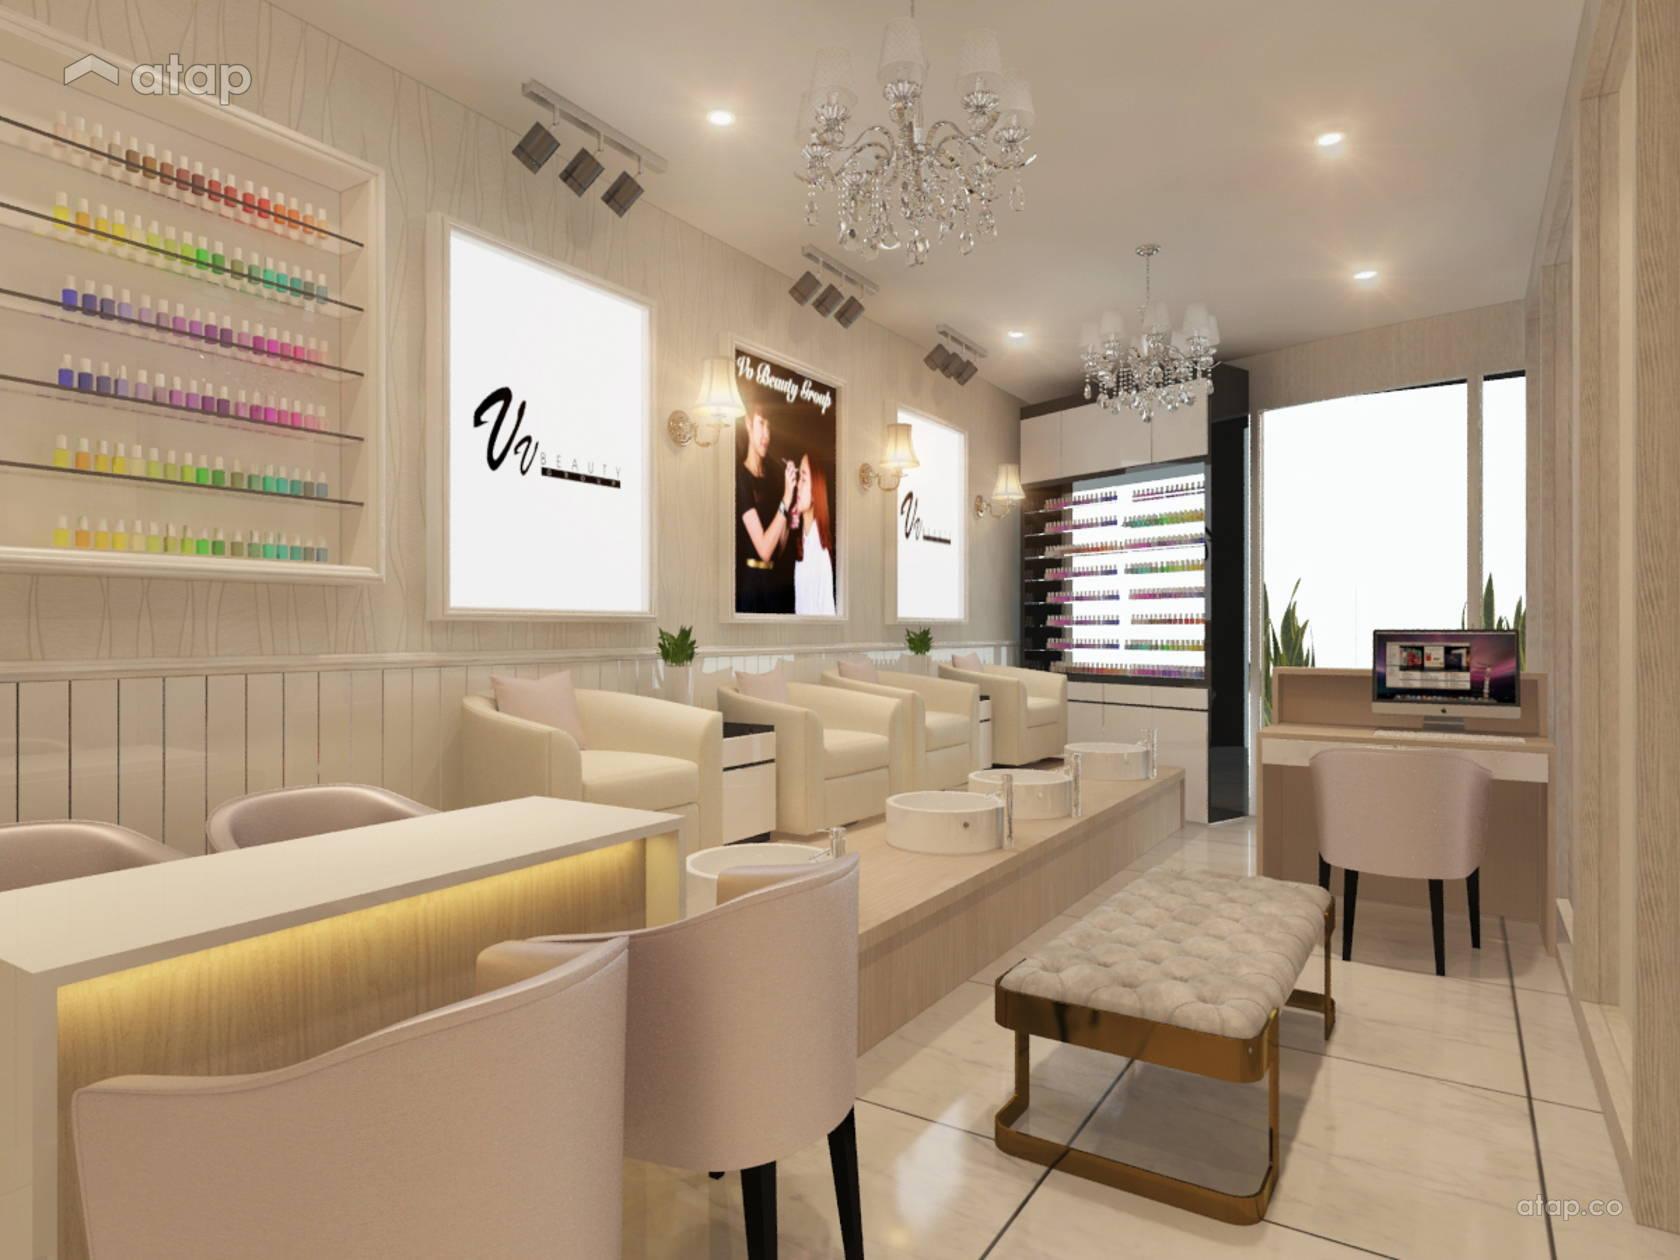 Nail beauty shop interior design renovation ideas, photos and price ...